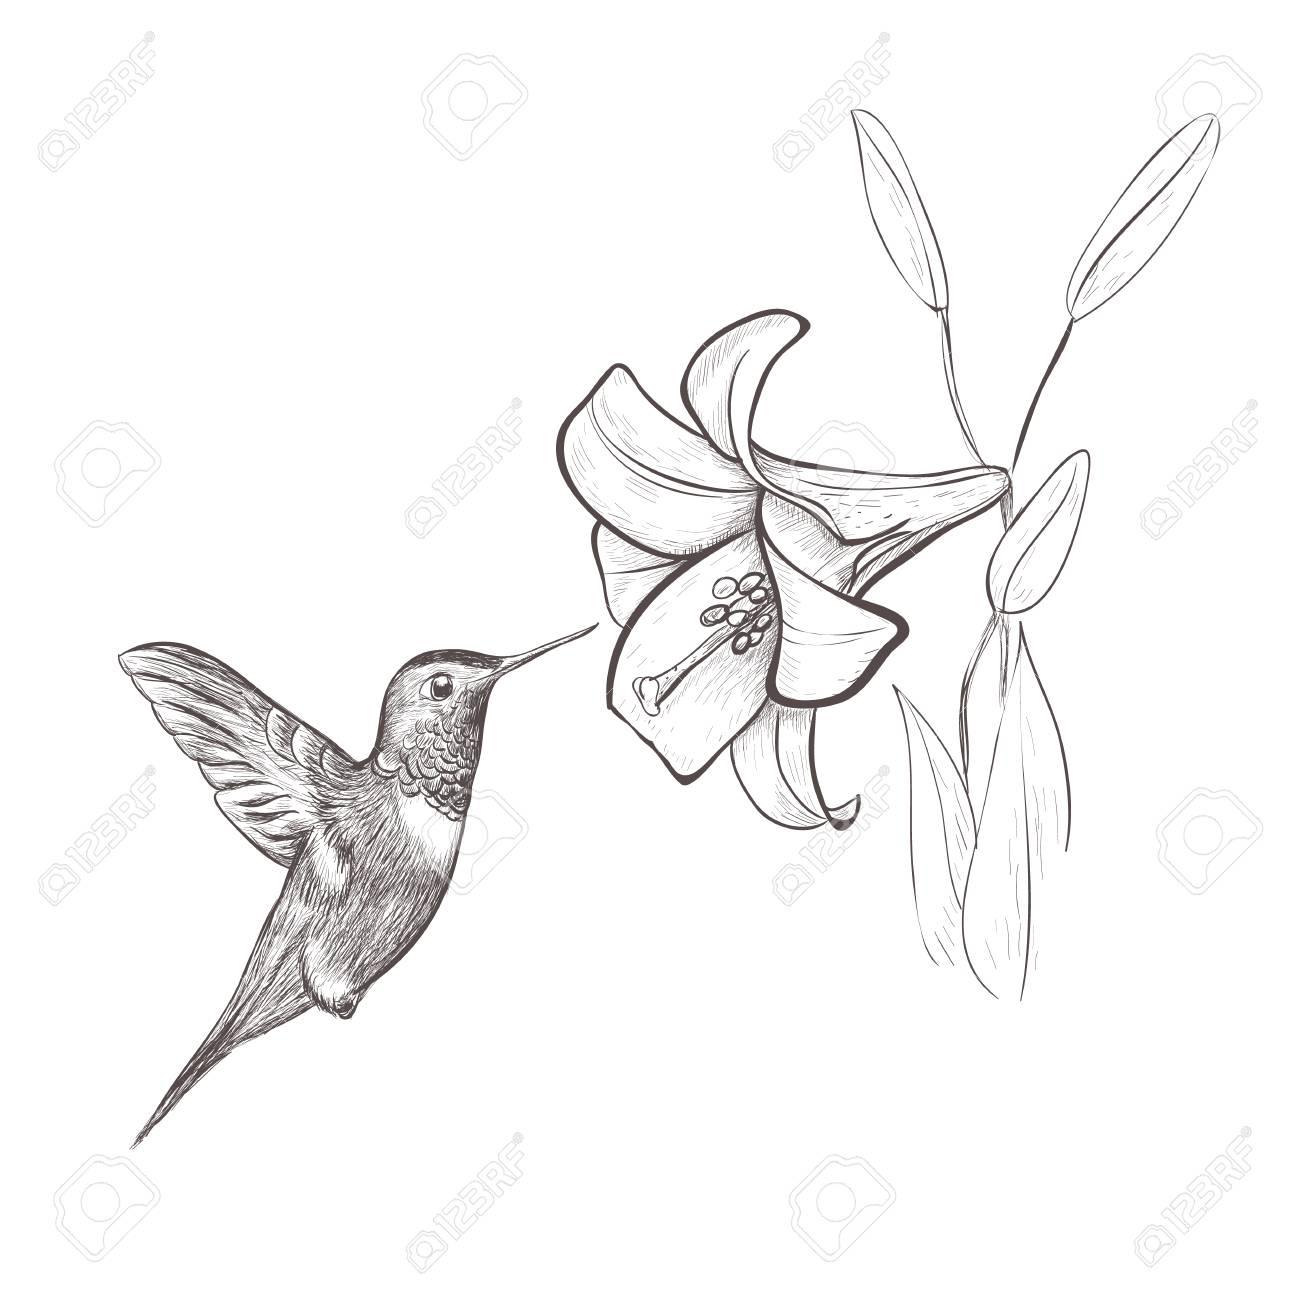 Line Art Hummingbird : Line drawing of hummingbird at getdrawings free for